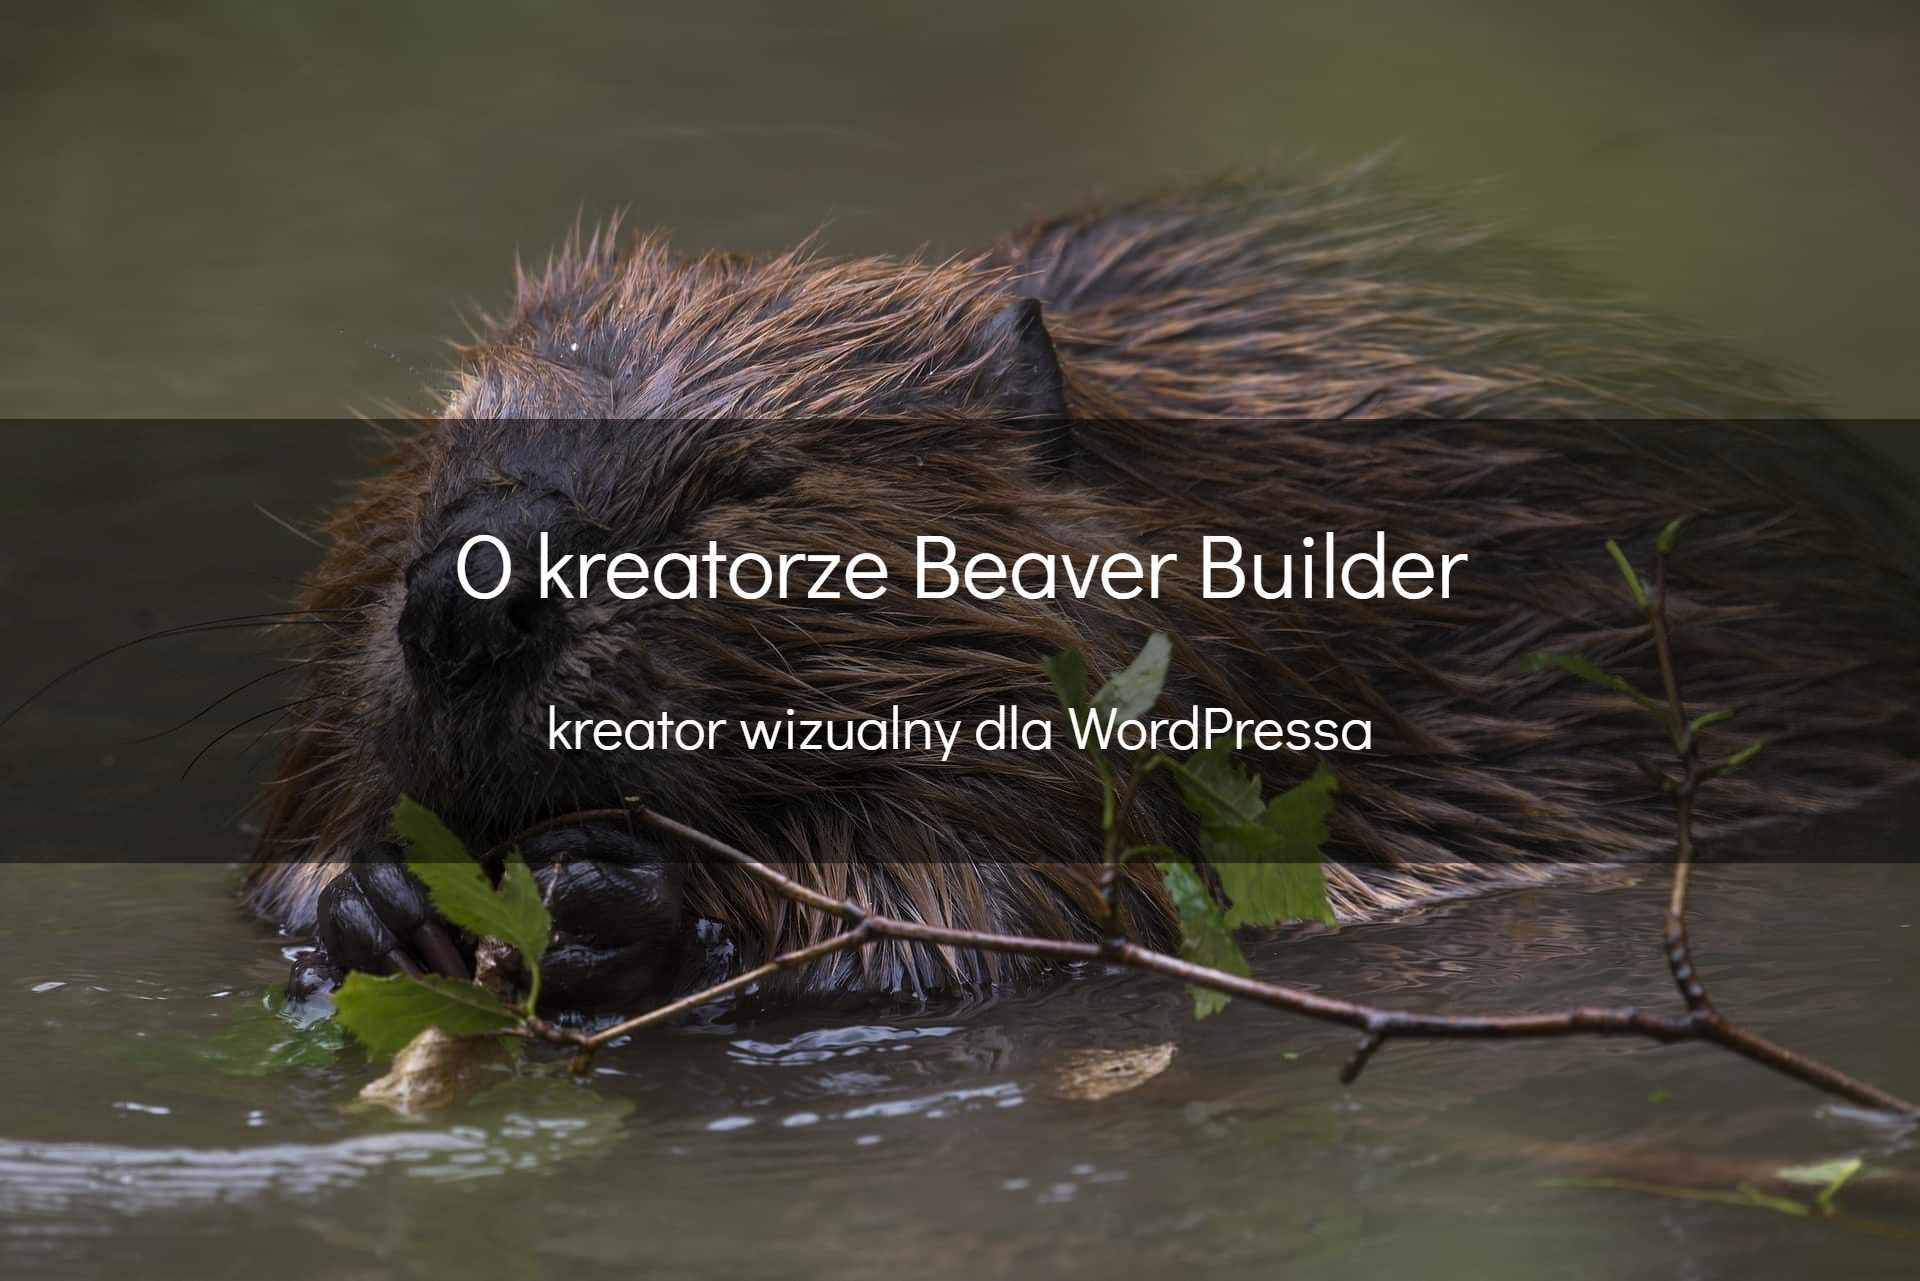 Okreatorze Beaver Builder